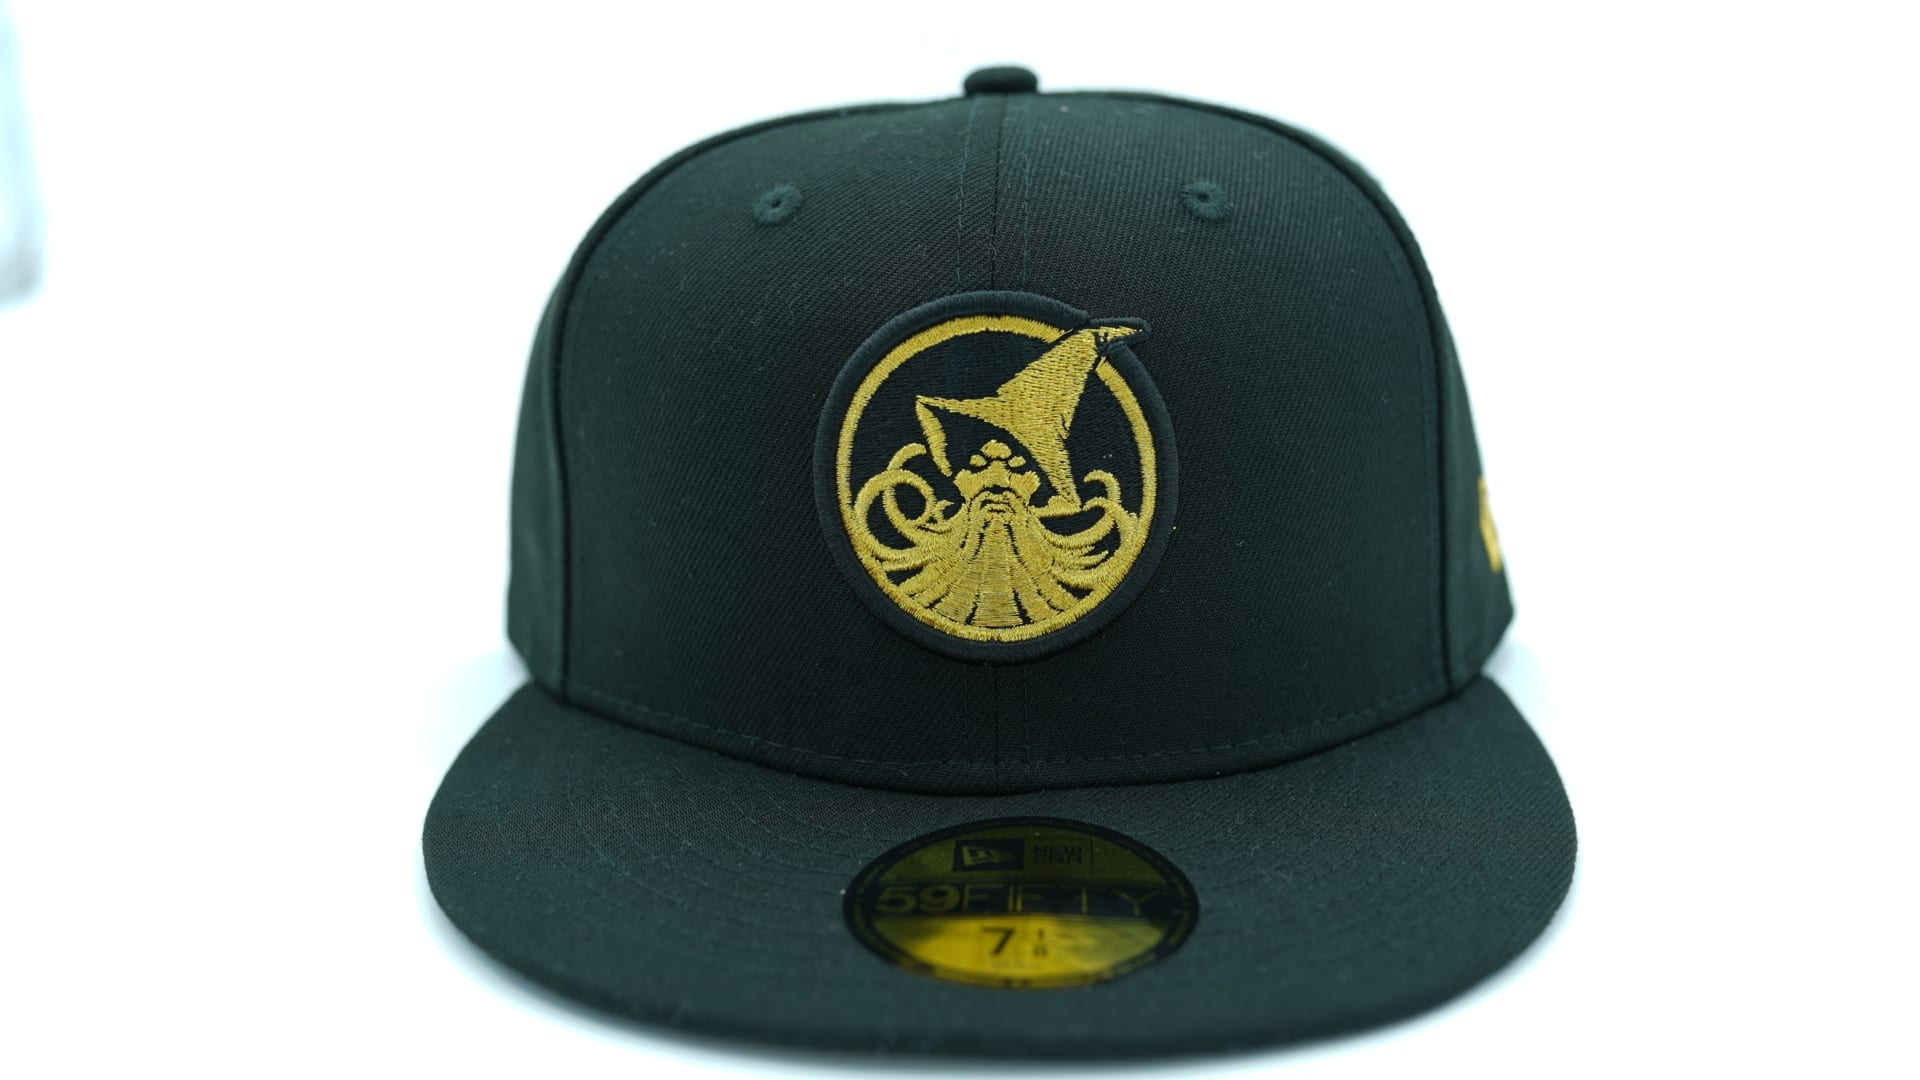 zephyr-fitted-baseball-cap-hat